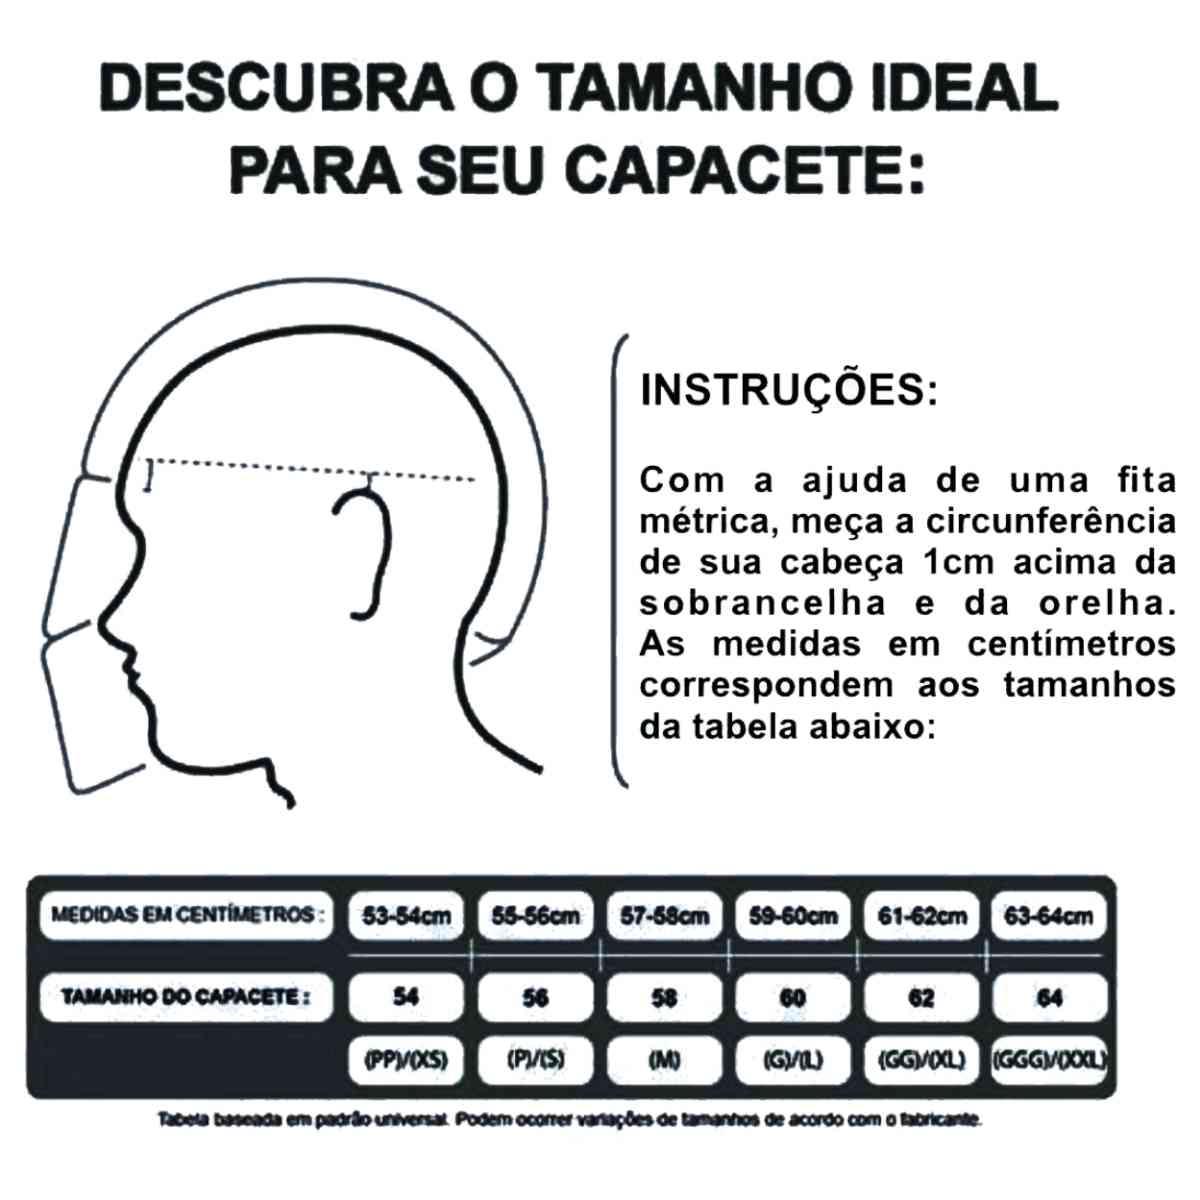 CAPACETE ABERTO KRAFT REVESTIDO COURO SINTÉTICO BEGE RETRÔ VINTAGE COM VISEIRA + BALACLAVA NINJA